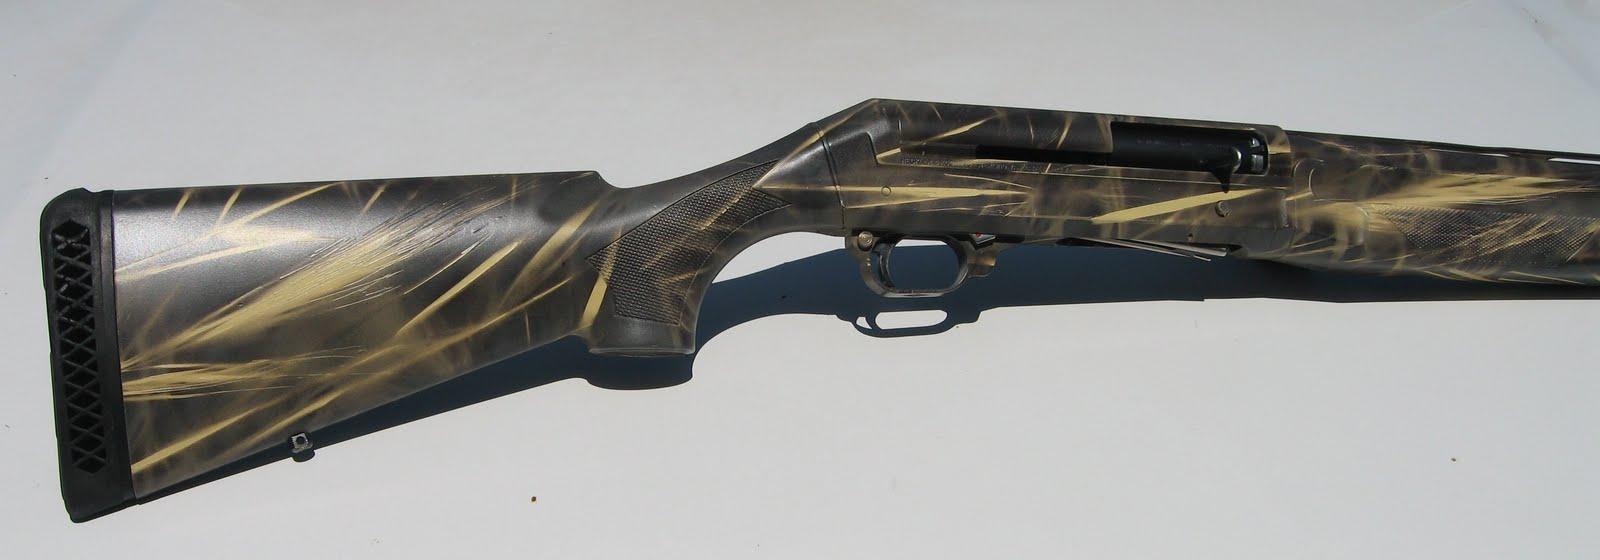 camo painted guns. Black Bedroom Furniture Sets. Home Design Ideas